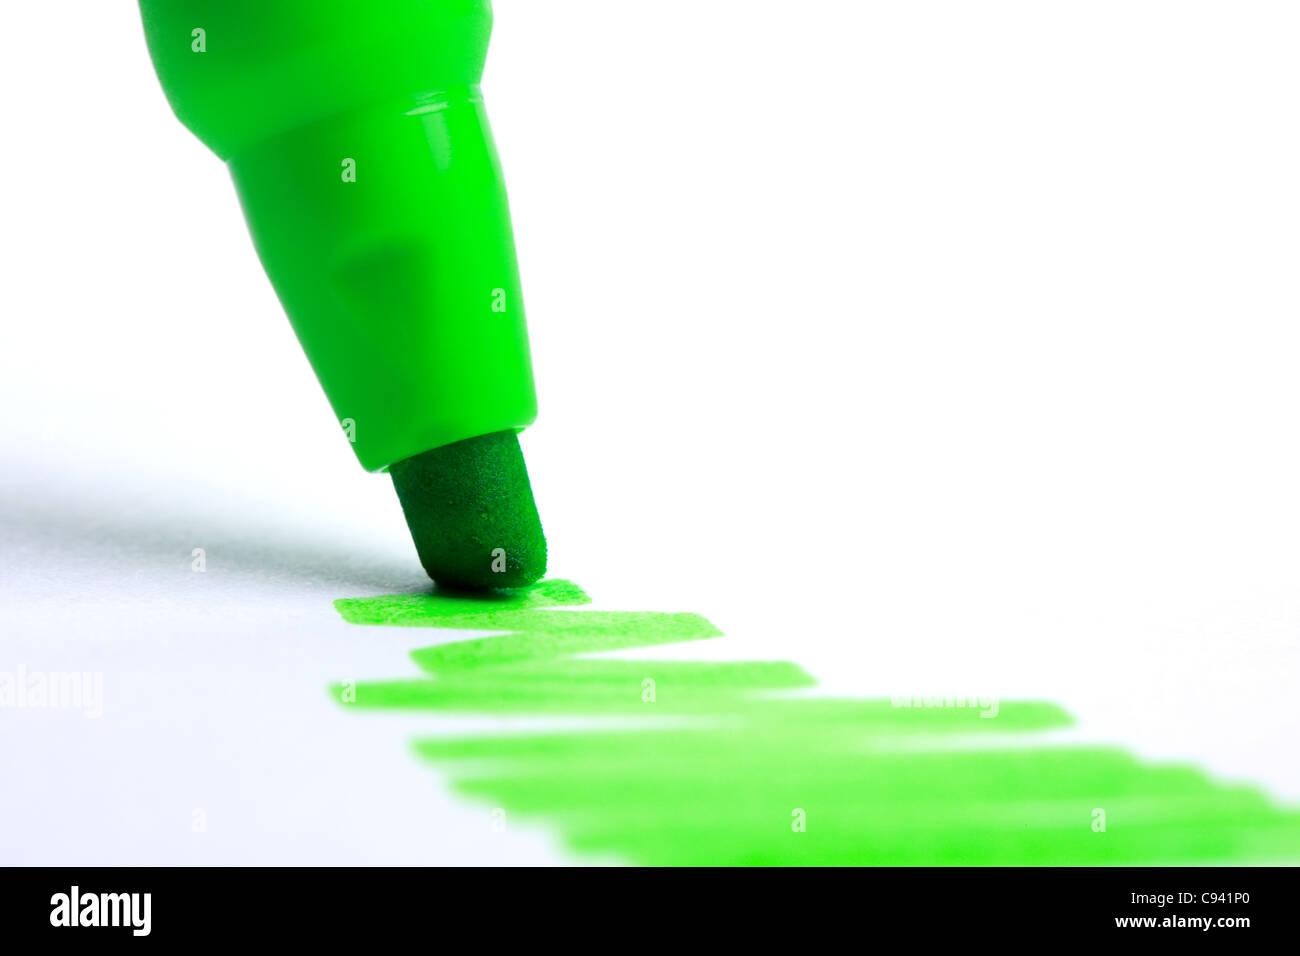 Surligneur vert Photo Stock